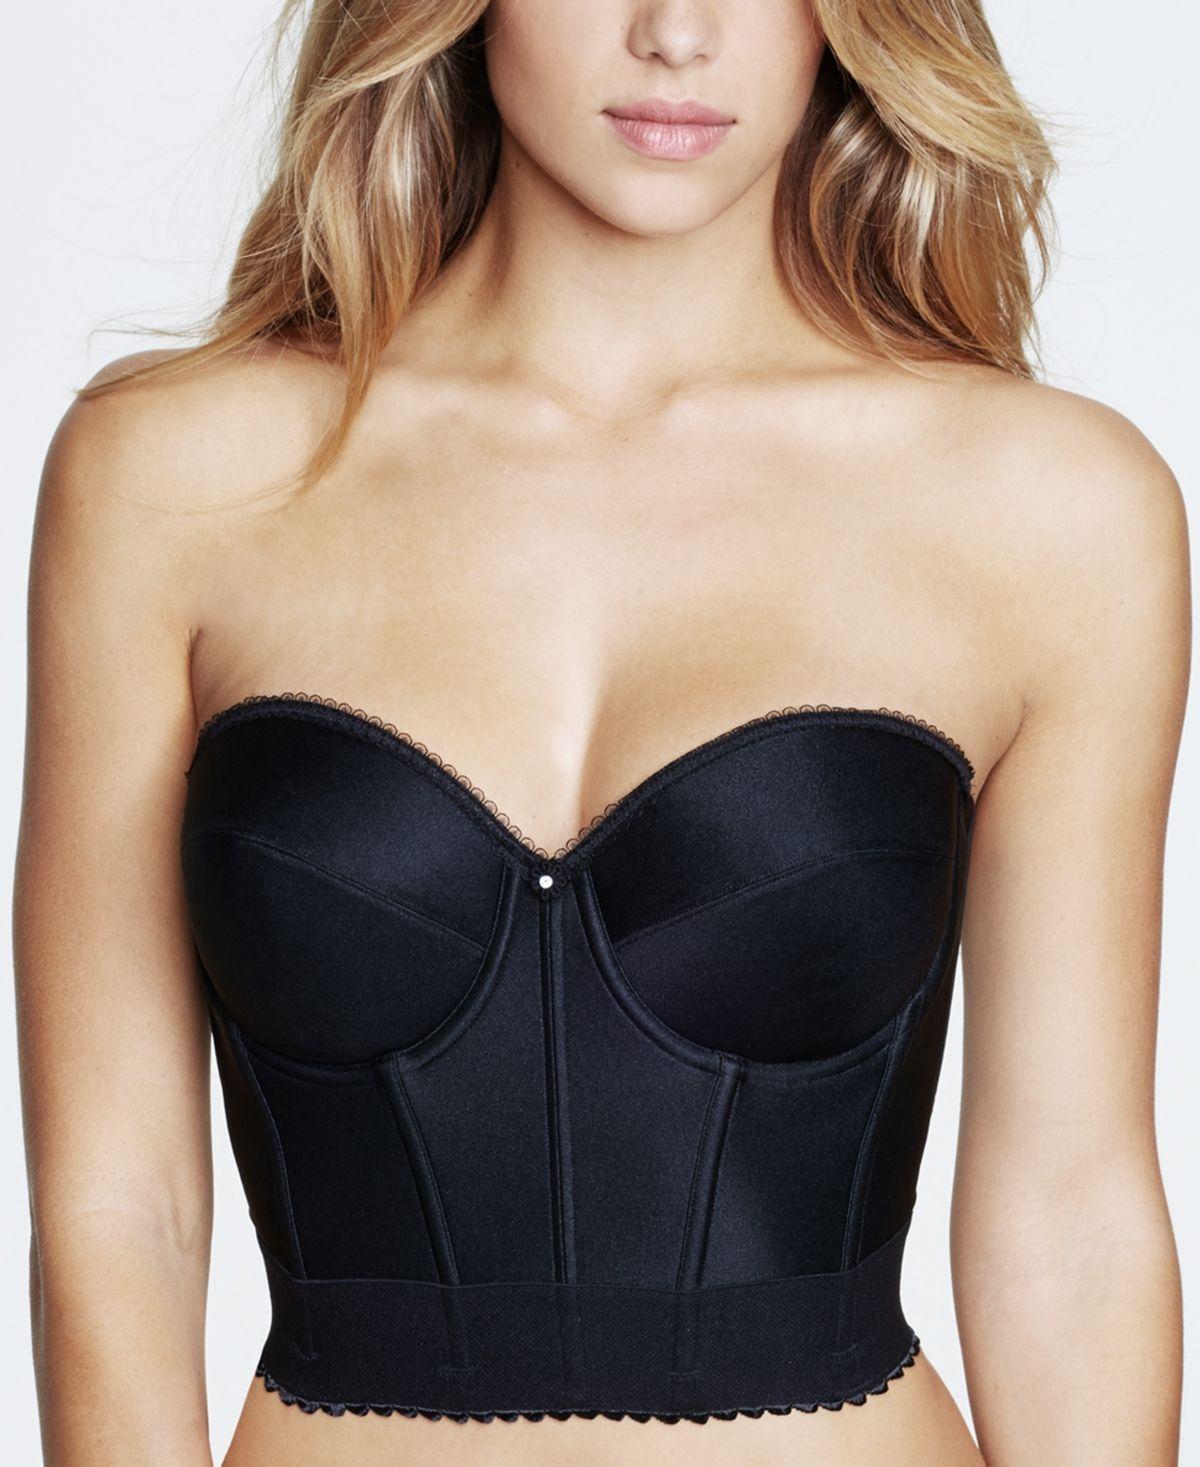 What Bra Should I Wear With A Backless Dress 10 Options That Look Great With Low Backs Dress Bra Bra Dress Backless Bra [ 740 x 1480 Pixel ]